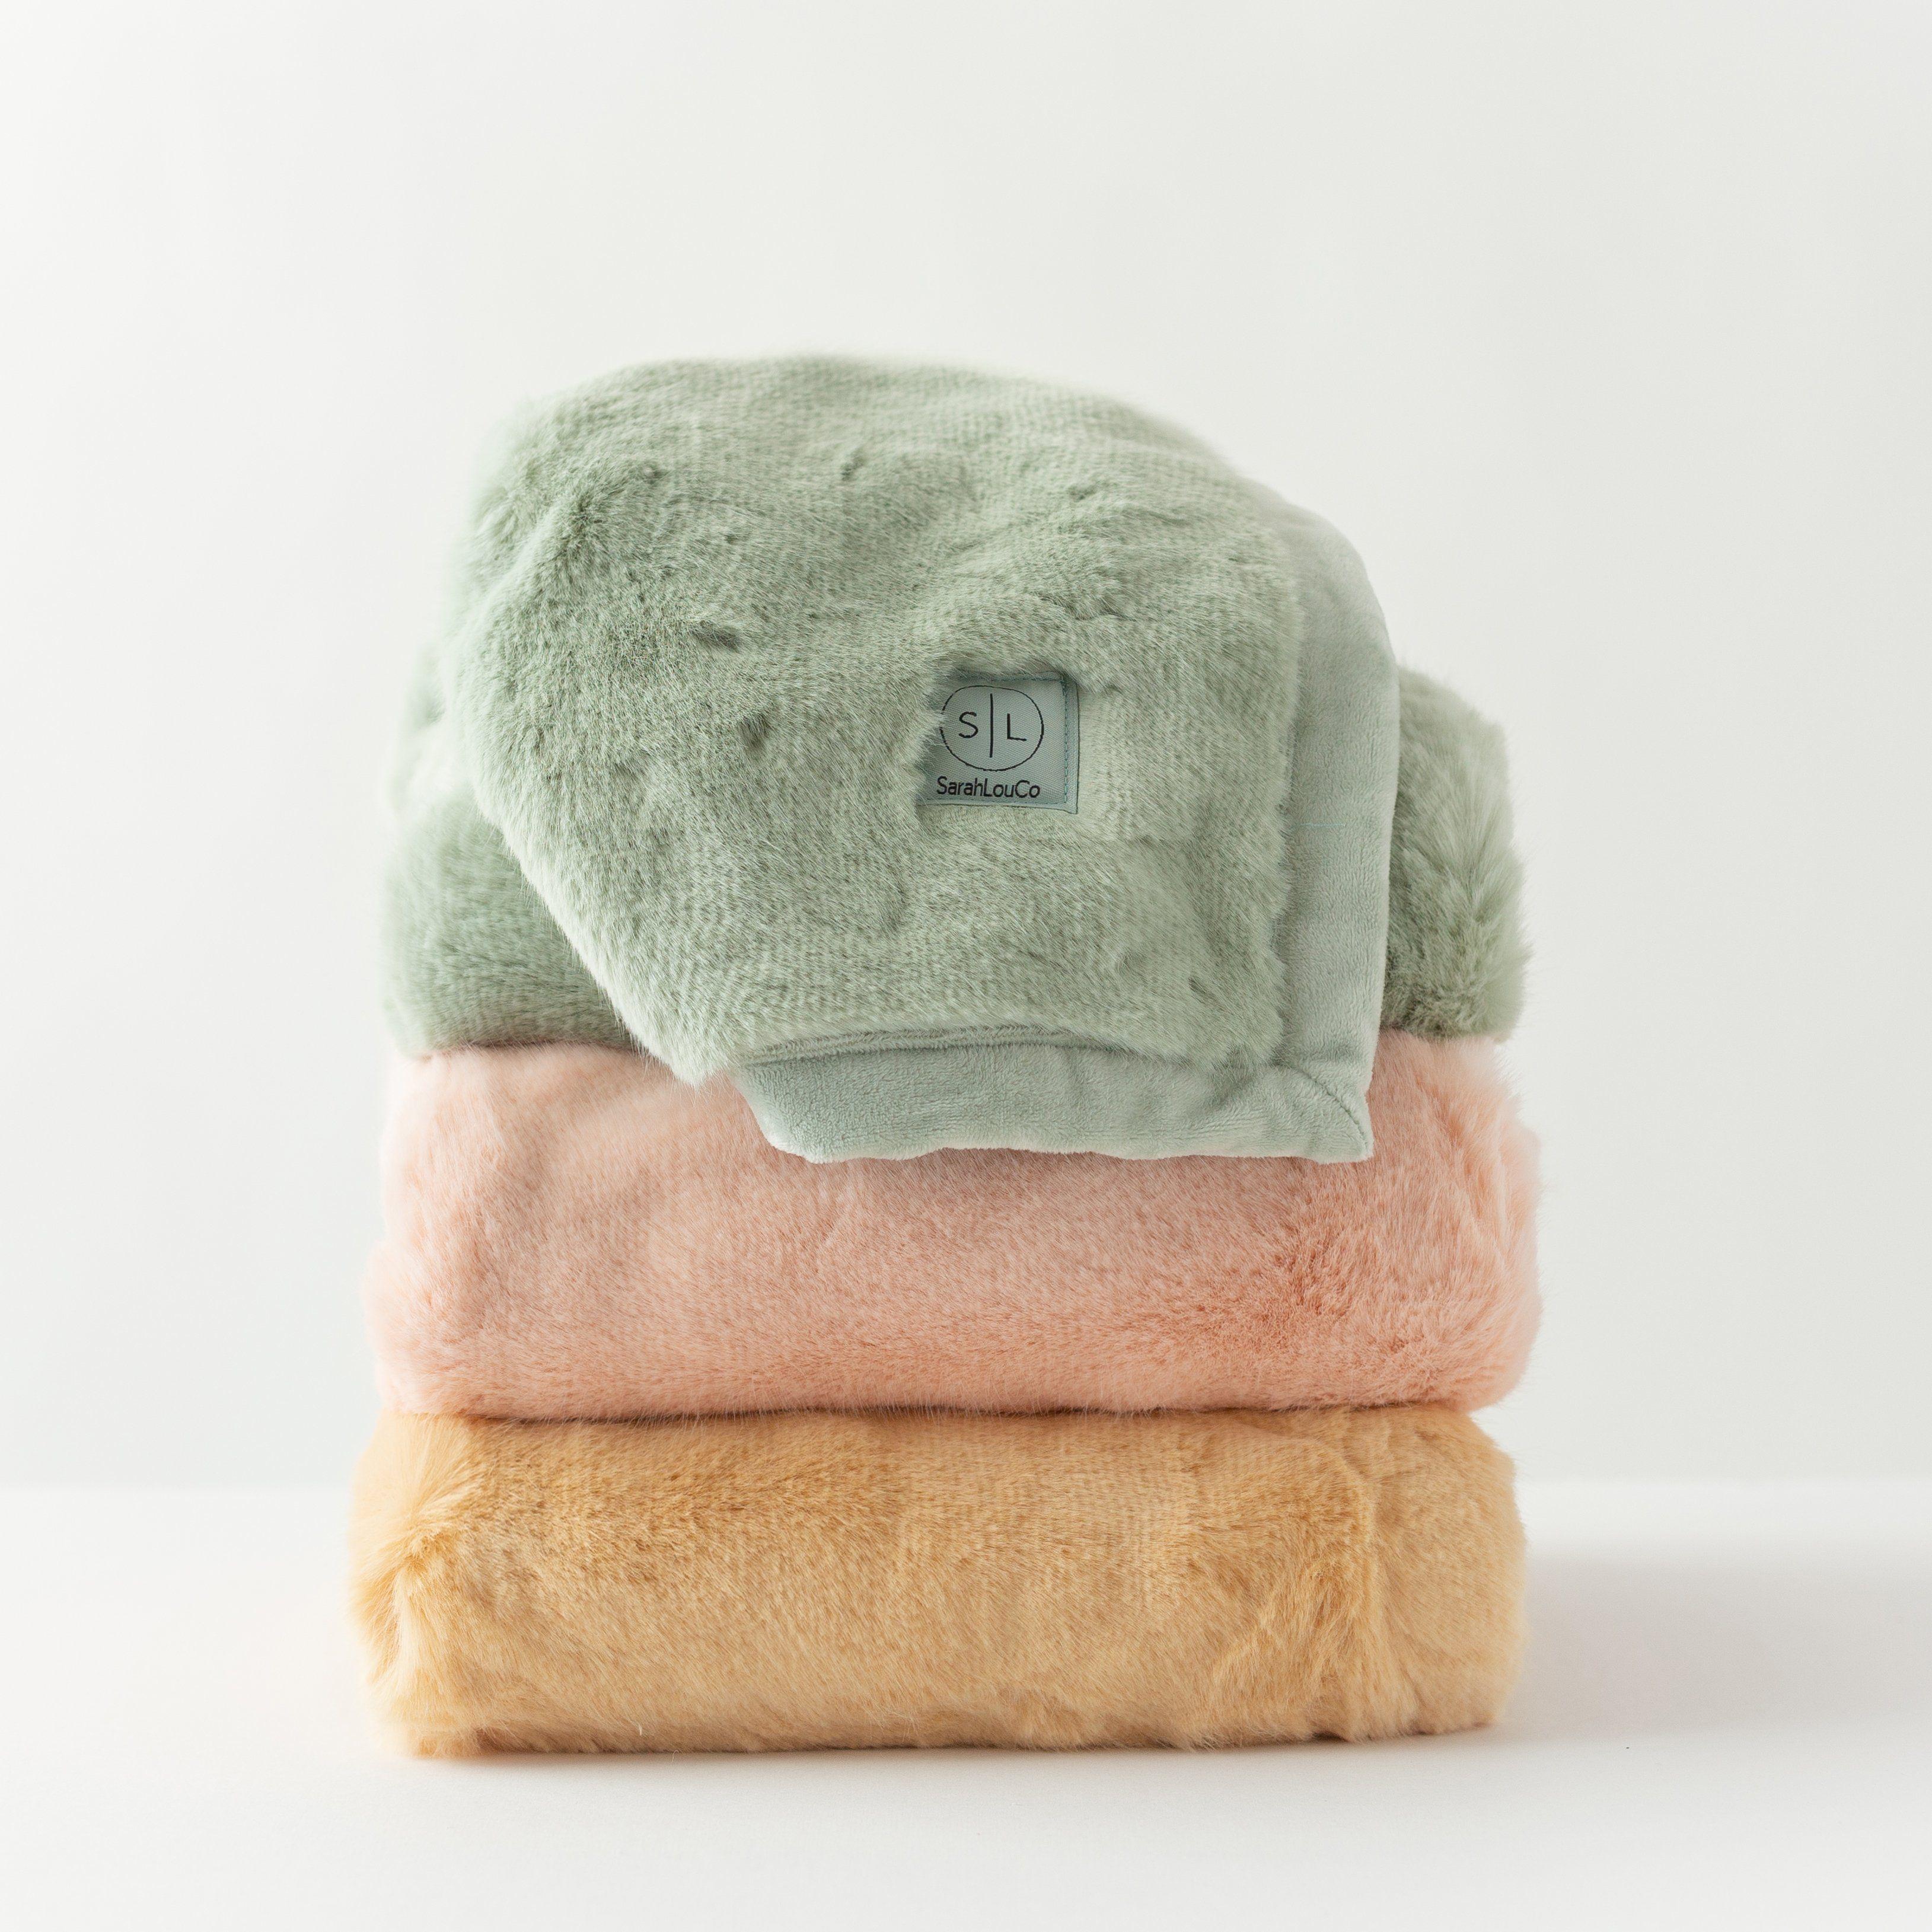 Rozzi Rose Faux Fur Blanket - Large